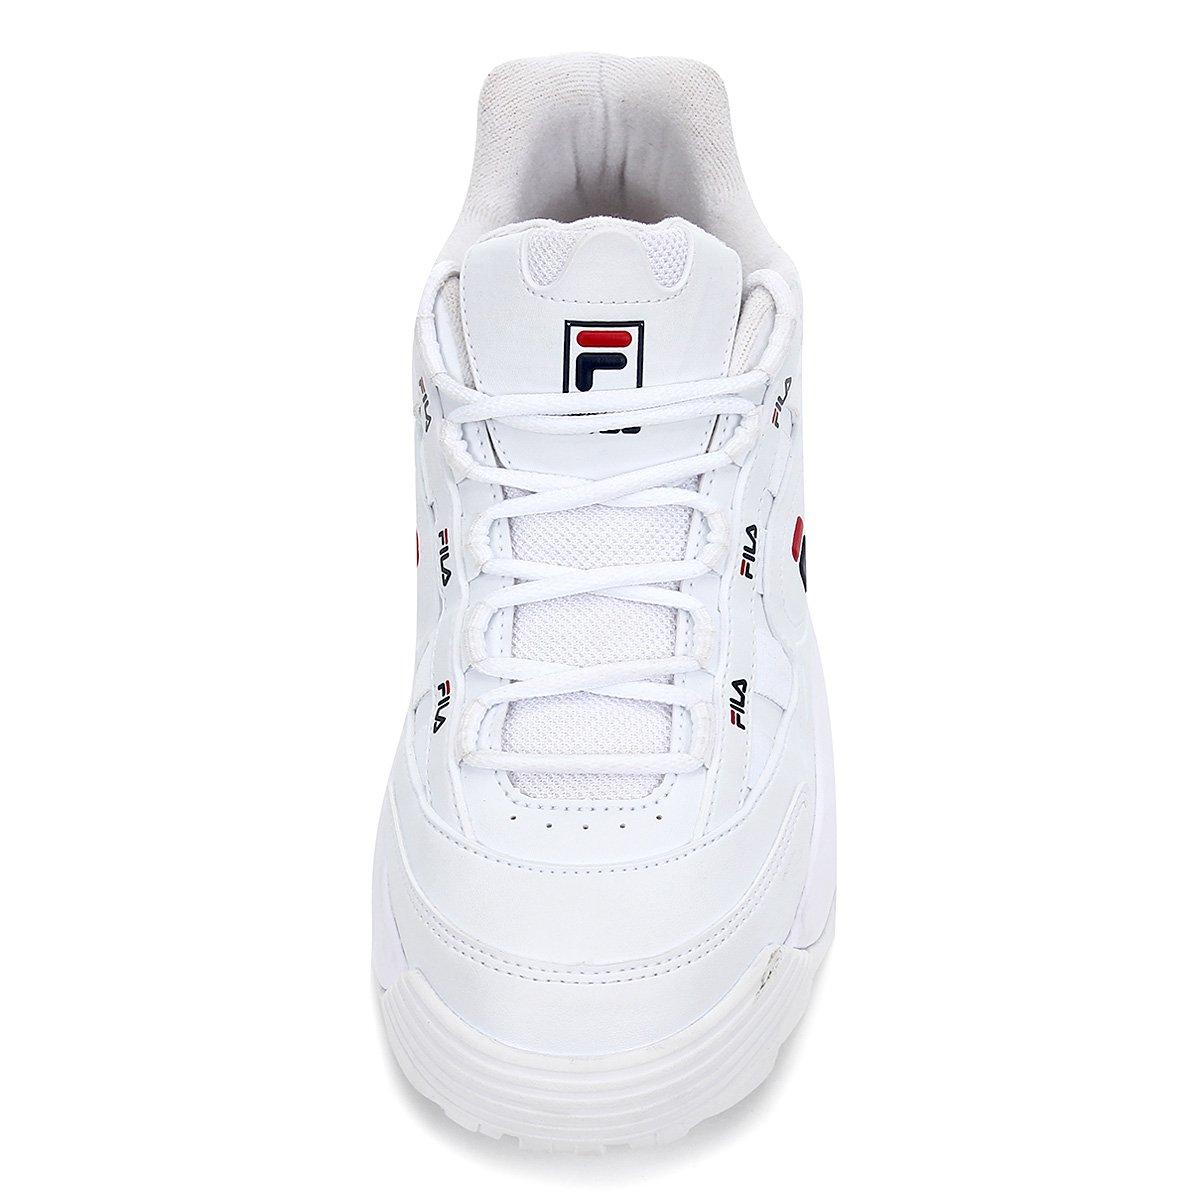 Tênis Fila D-Formation Feminino Branco/Vermelho